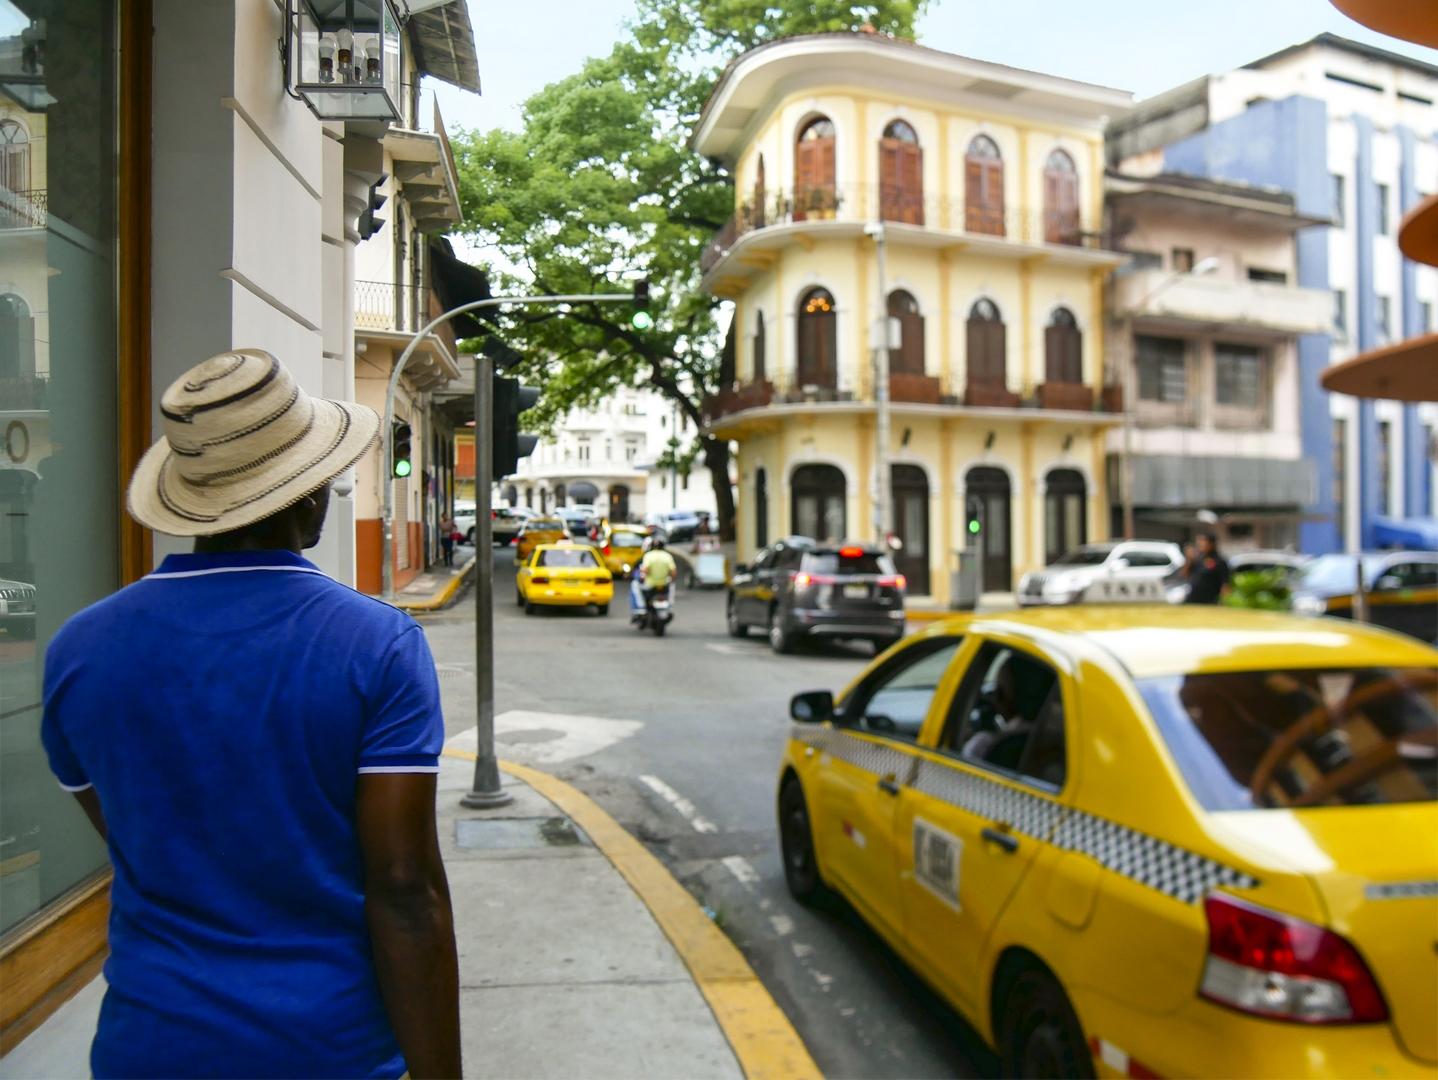 Panama Citystadtführung_Kolonialstil_Panamareise